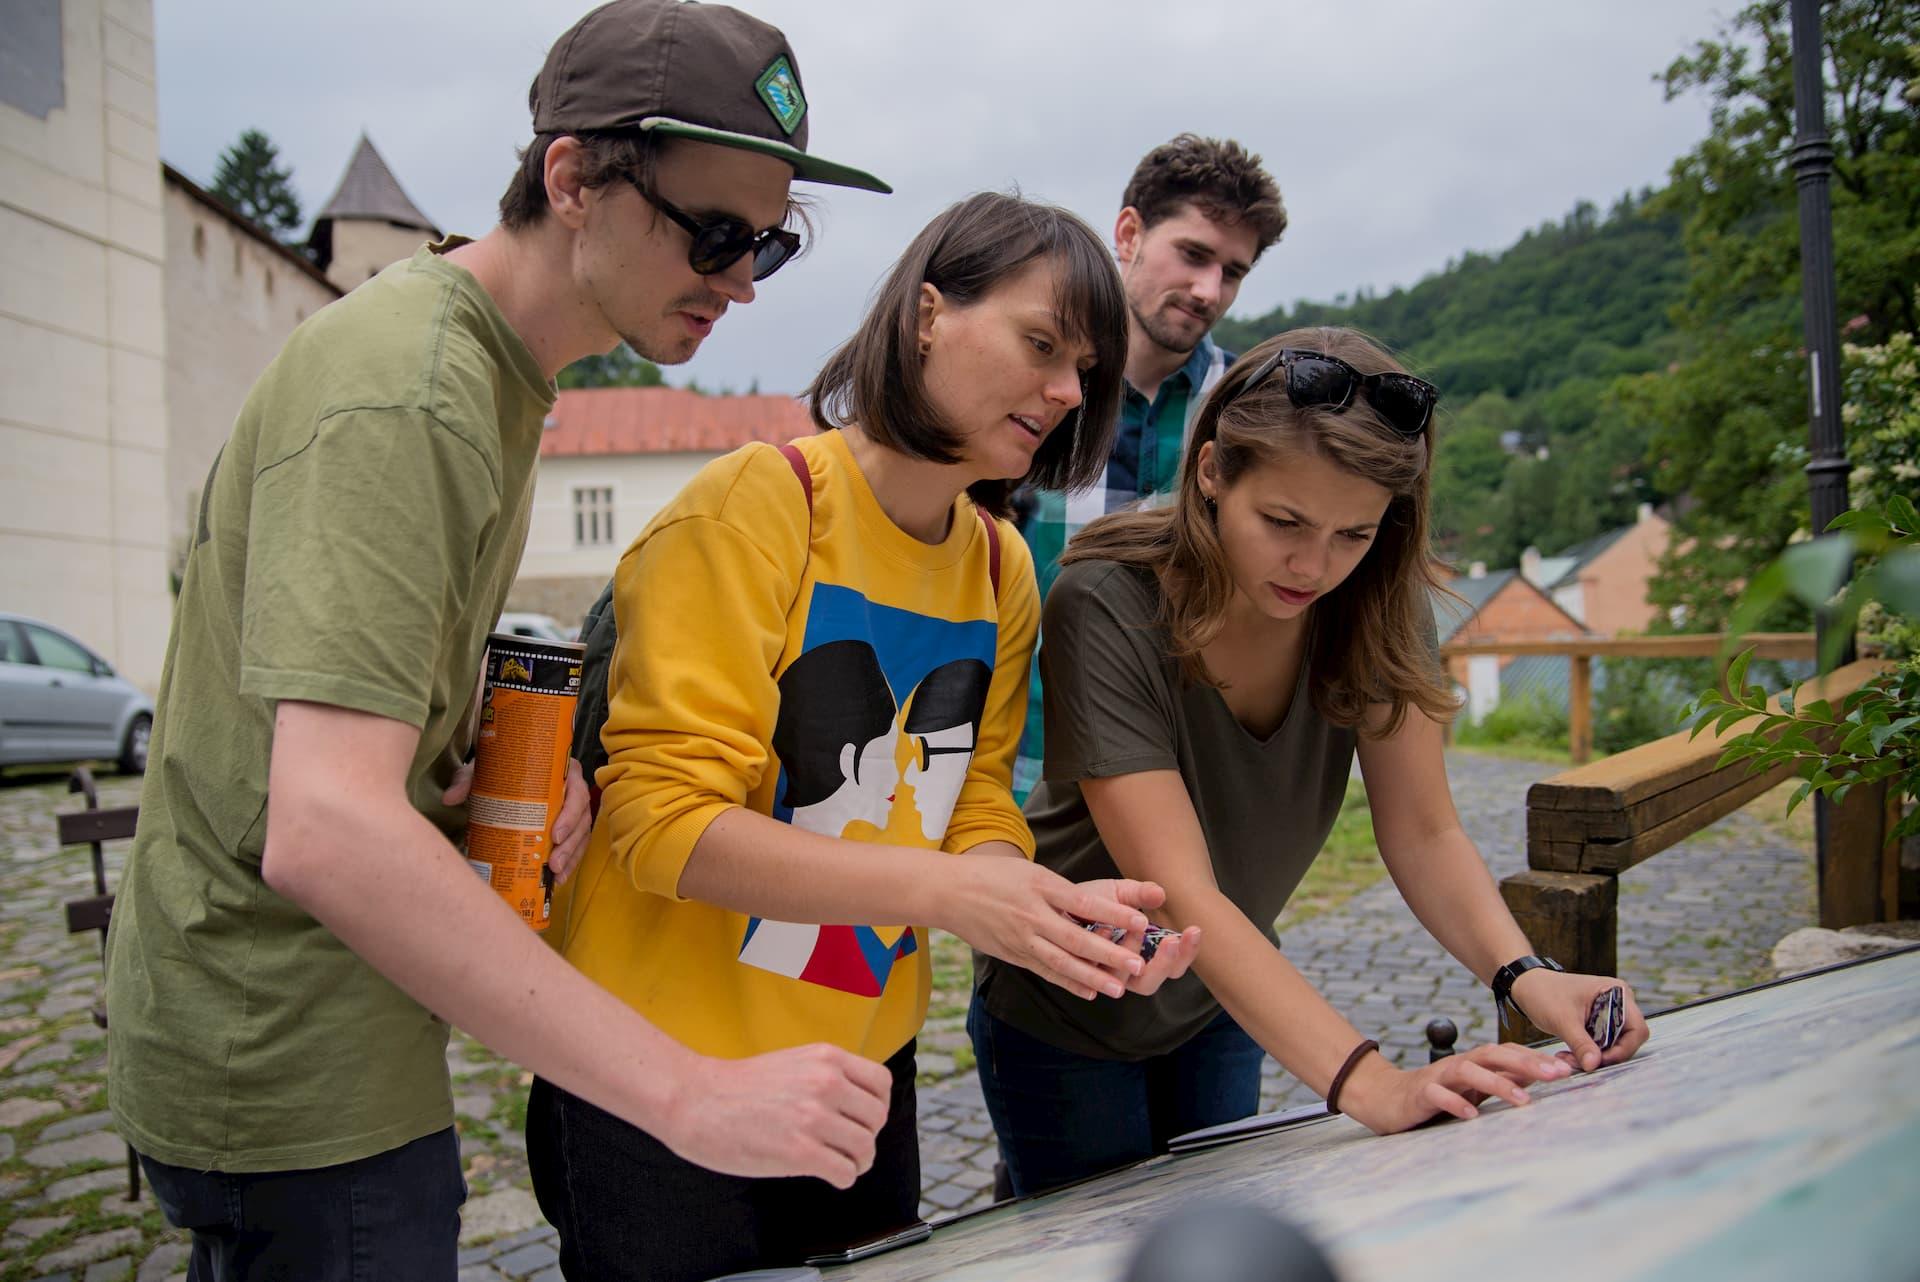 Zdroj: urbangames.sk